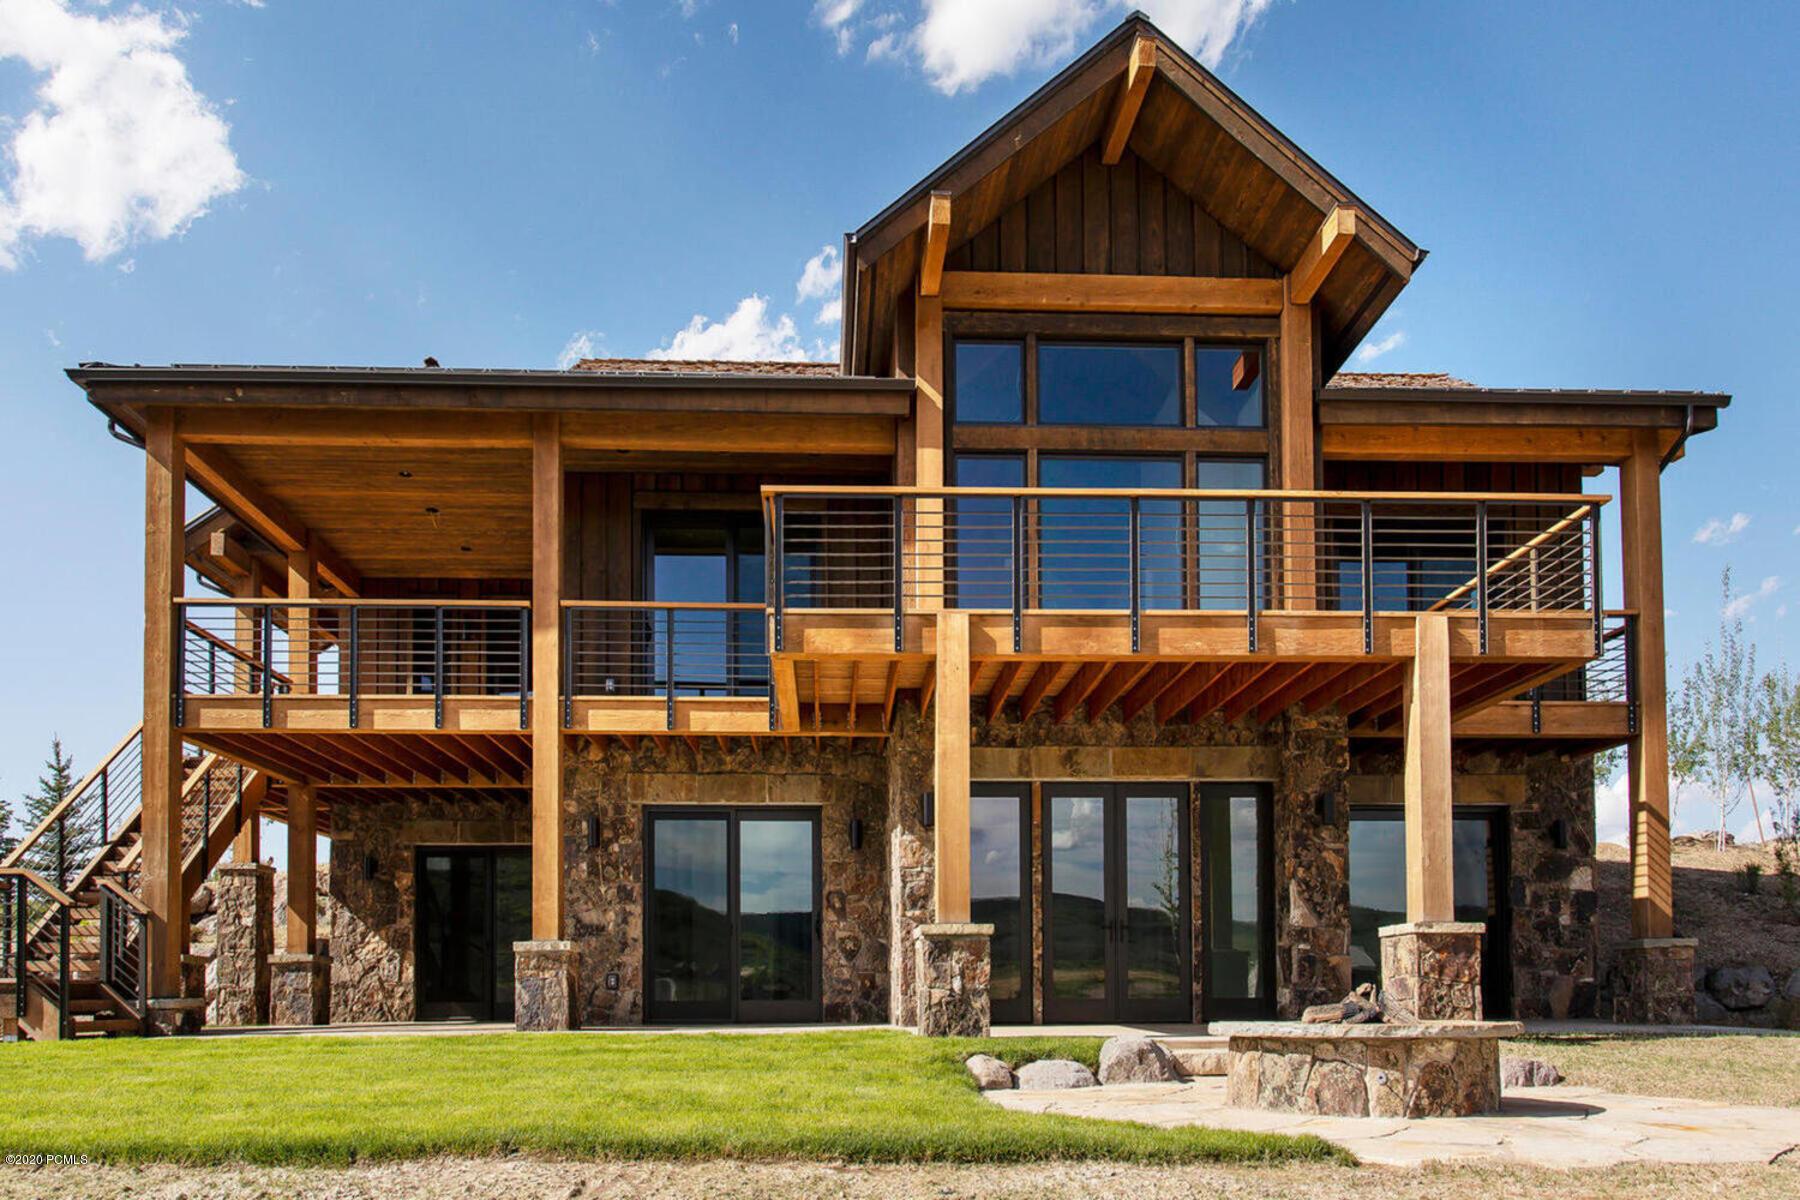 5844 Shooting Star Circle, Heber City, Utah 84032, 5 Bedrooms Bedrooms, ,6 BathroomsBathrooms,Single Family,For Sale,Shooting Star,12003792